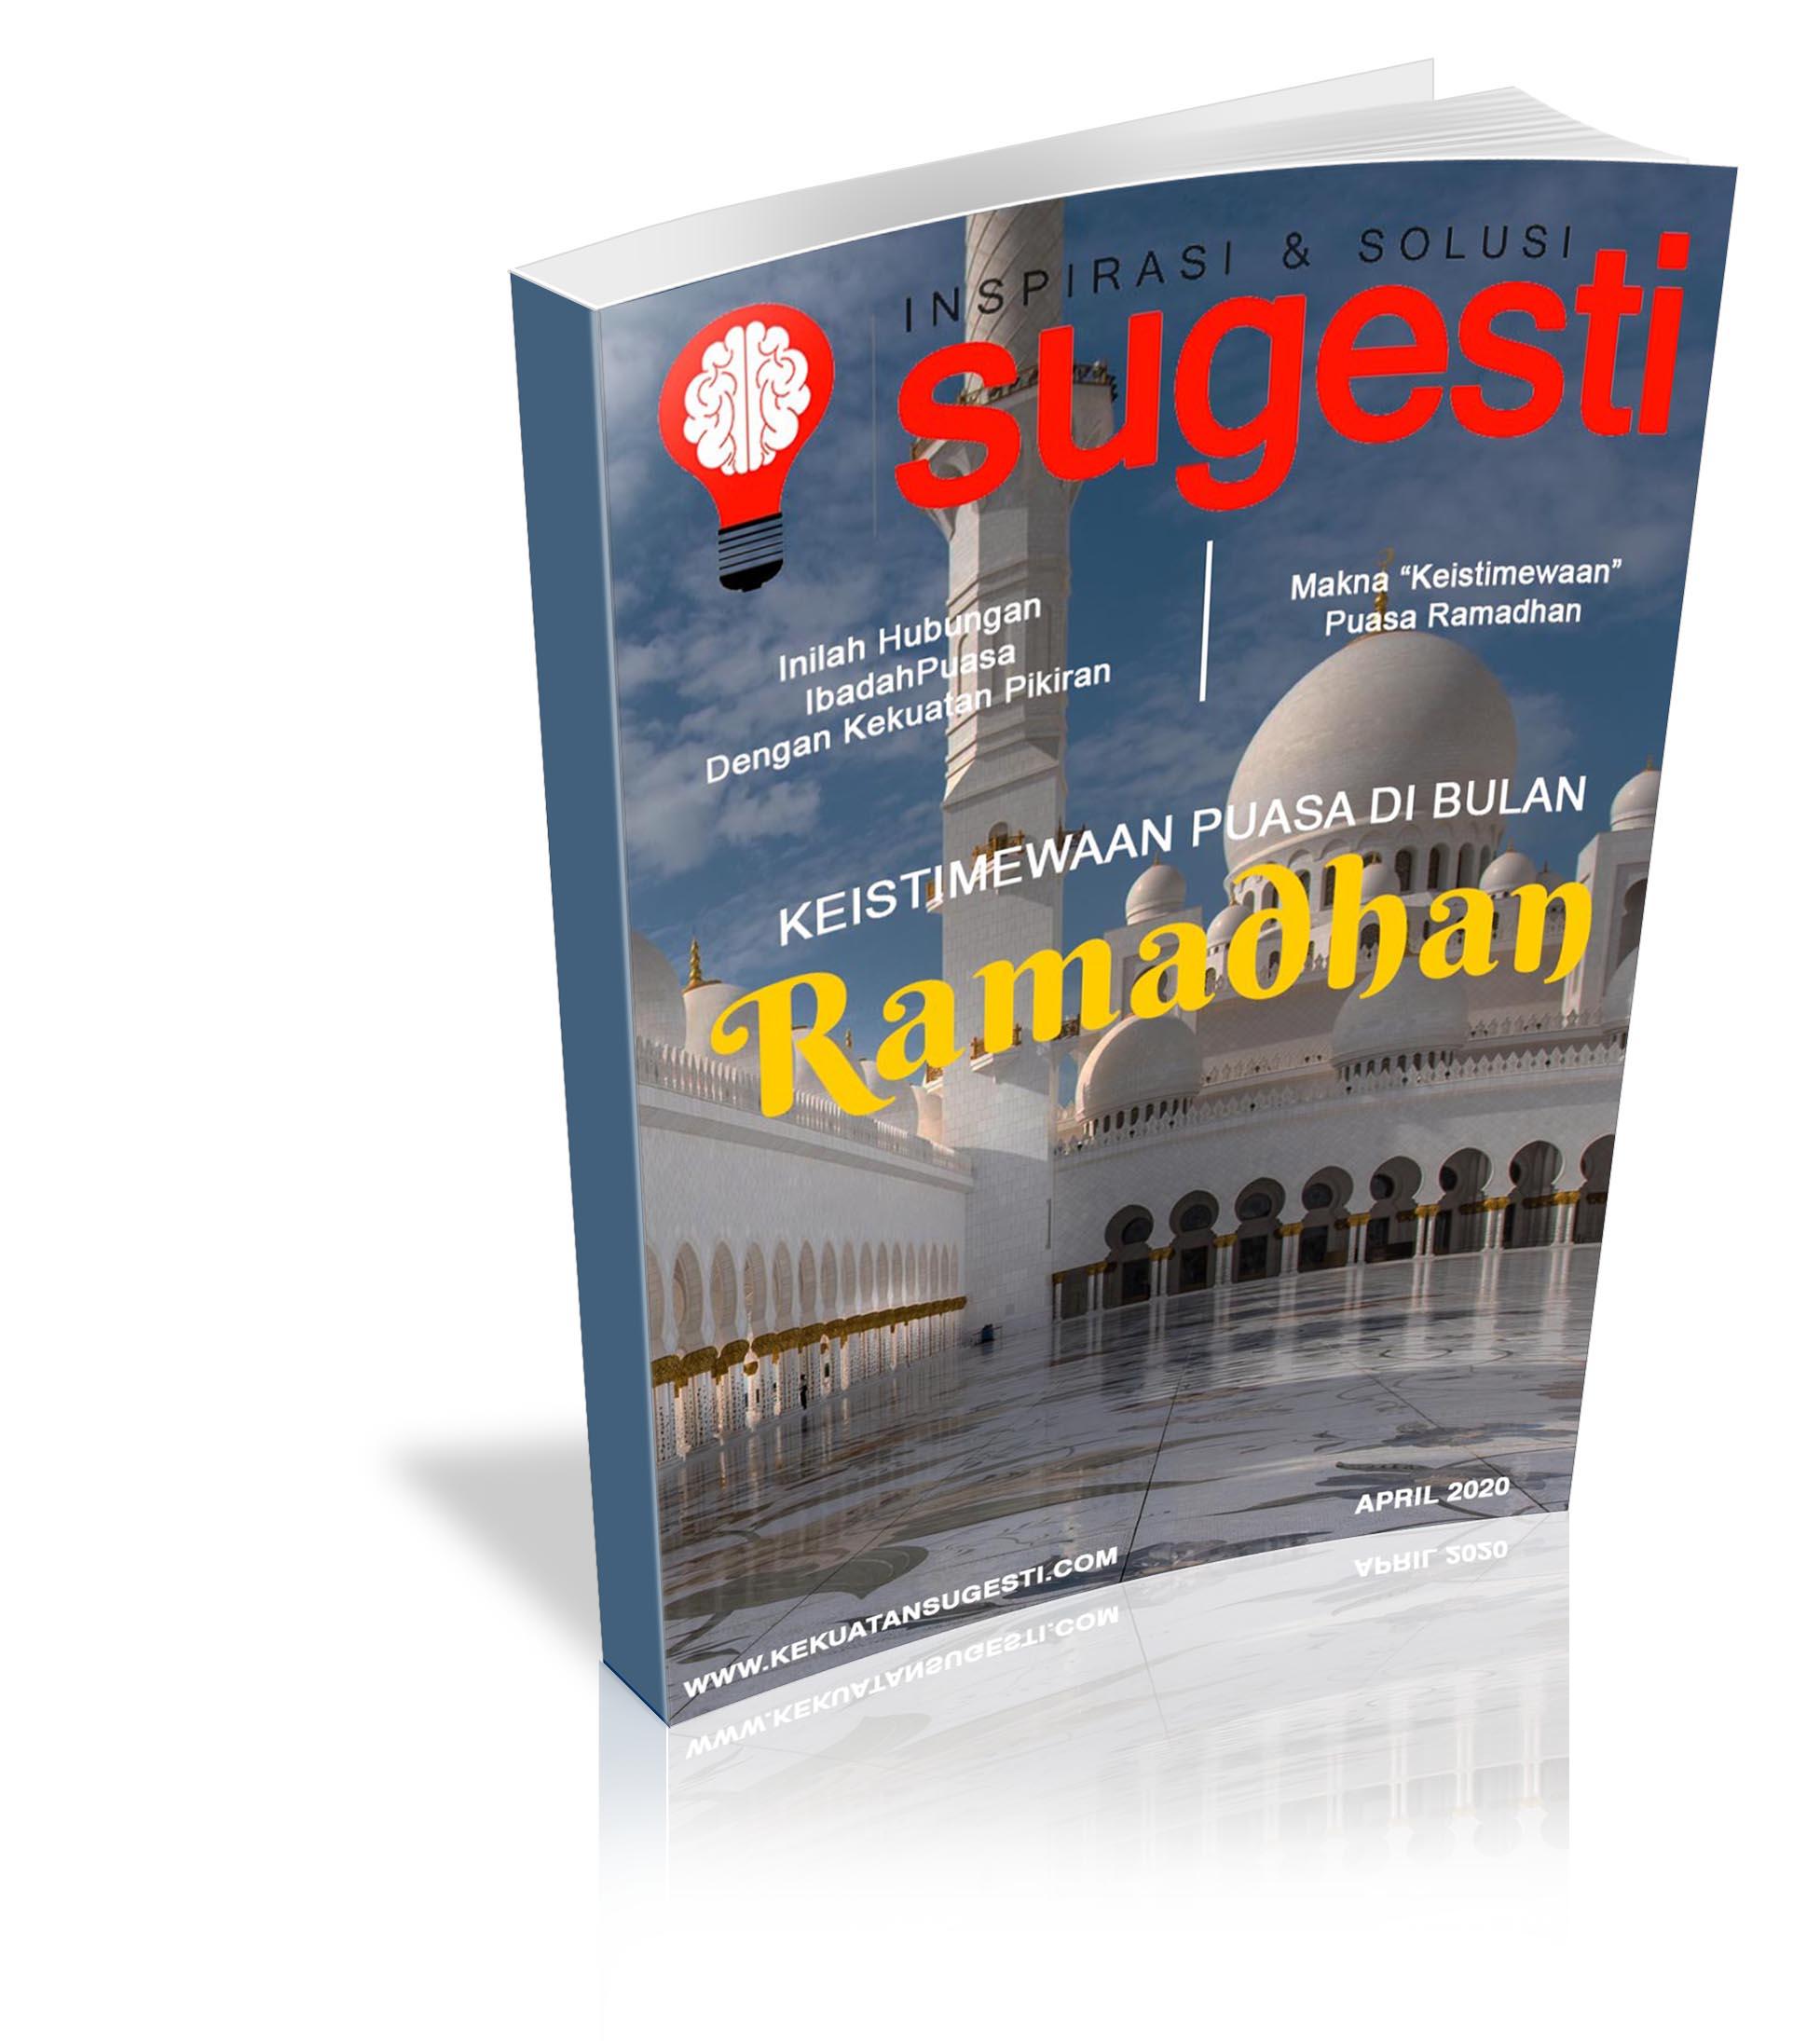 Majalah Sugesti Edisi ke Tujuh Puluh bulan April 2020